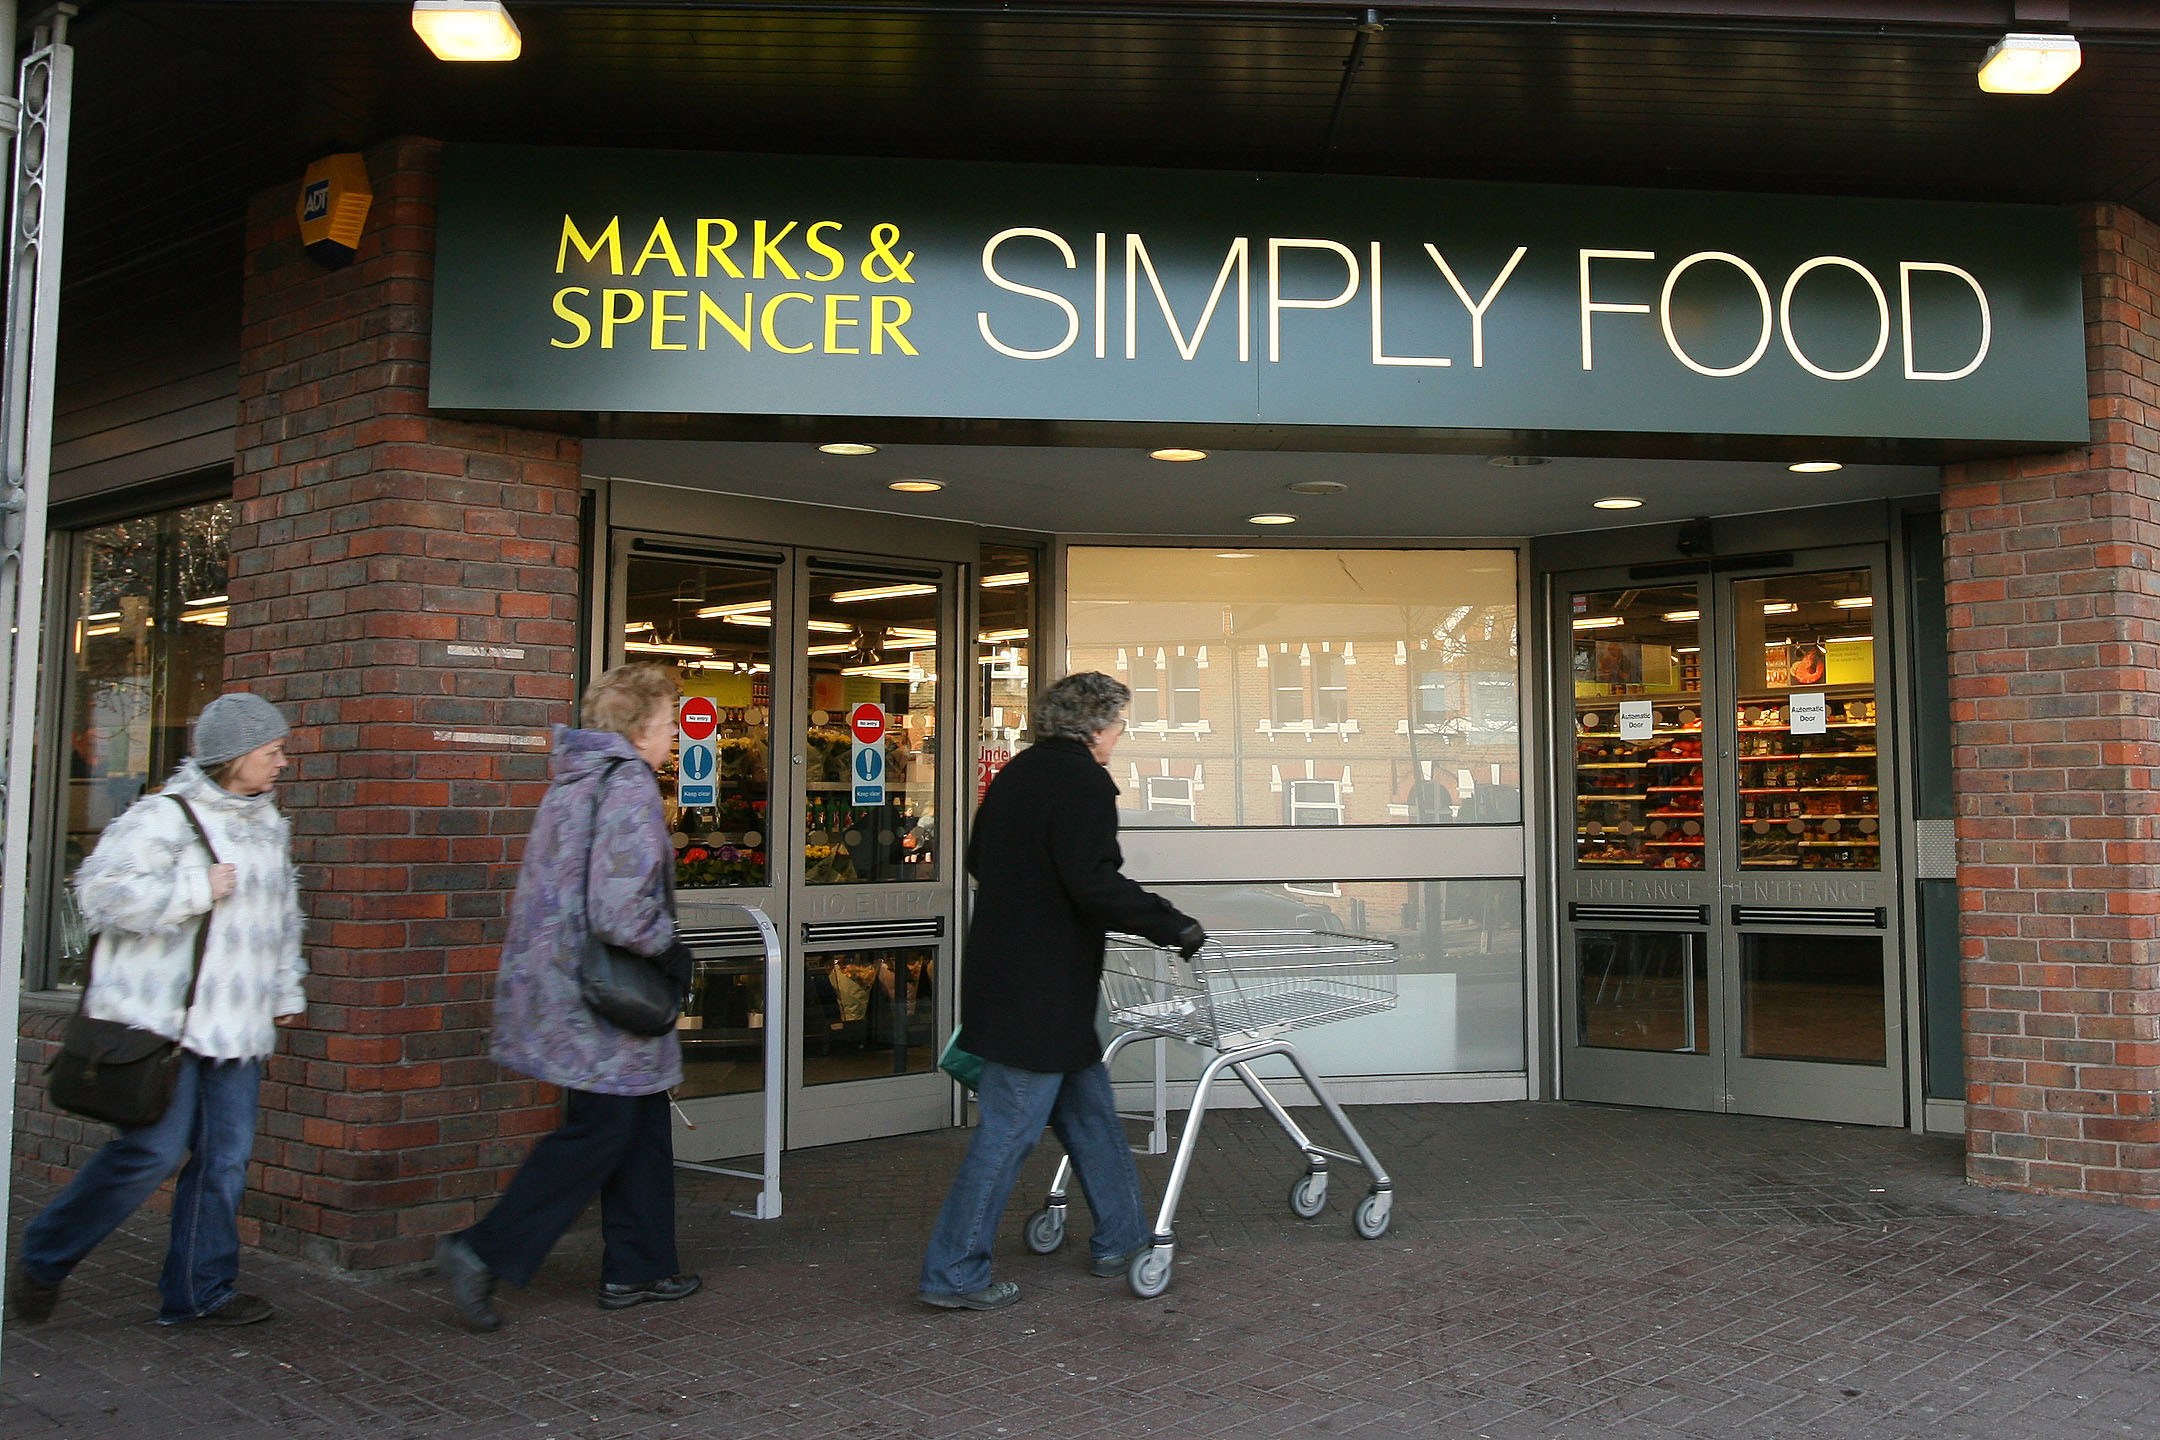 Marks and Spencer to close 25 food stores under estate rethink